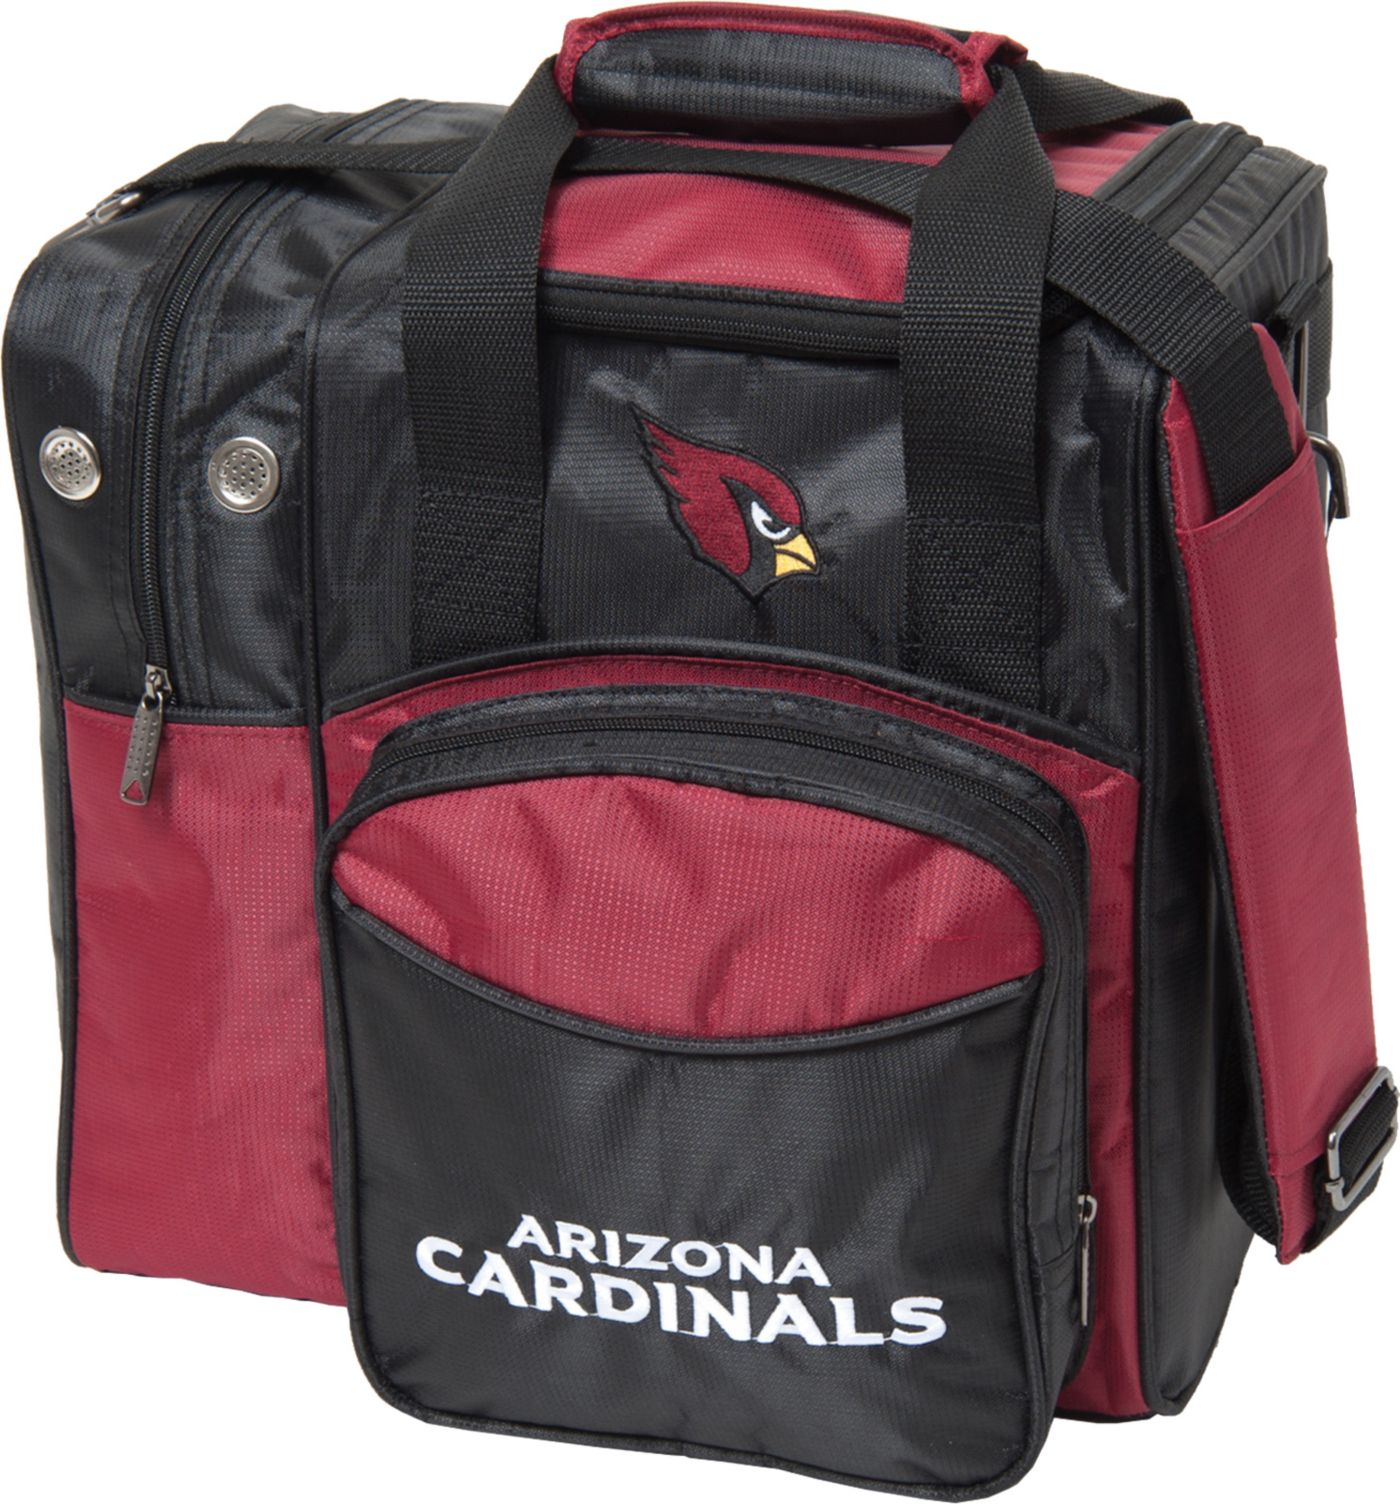 Strikeforce NFL Licensed Single Tote Bowling Bag